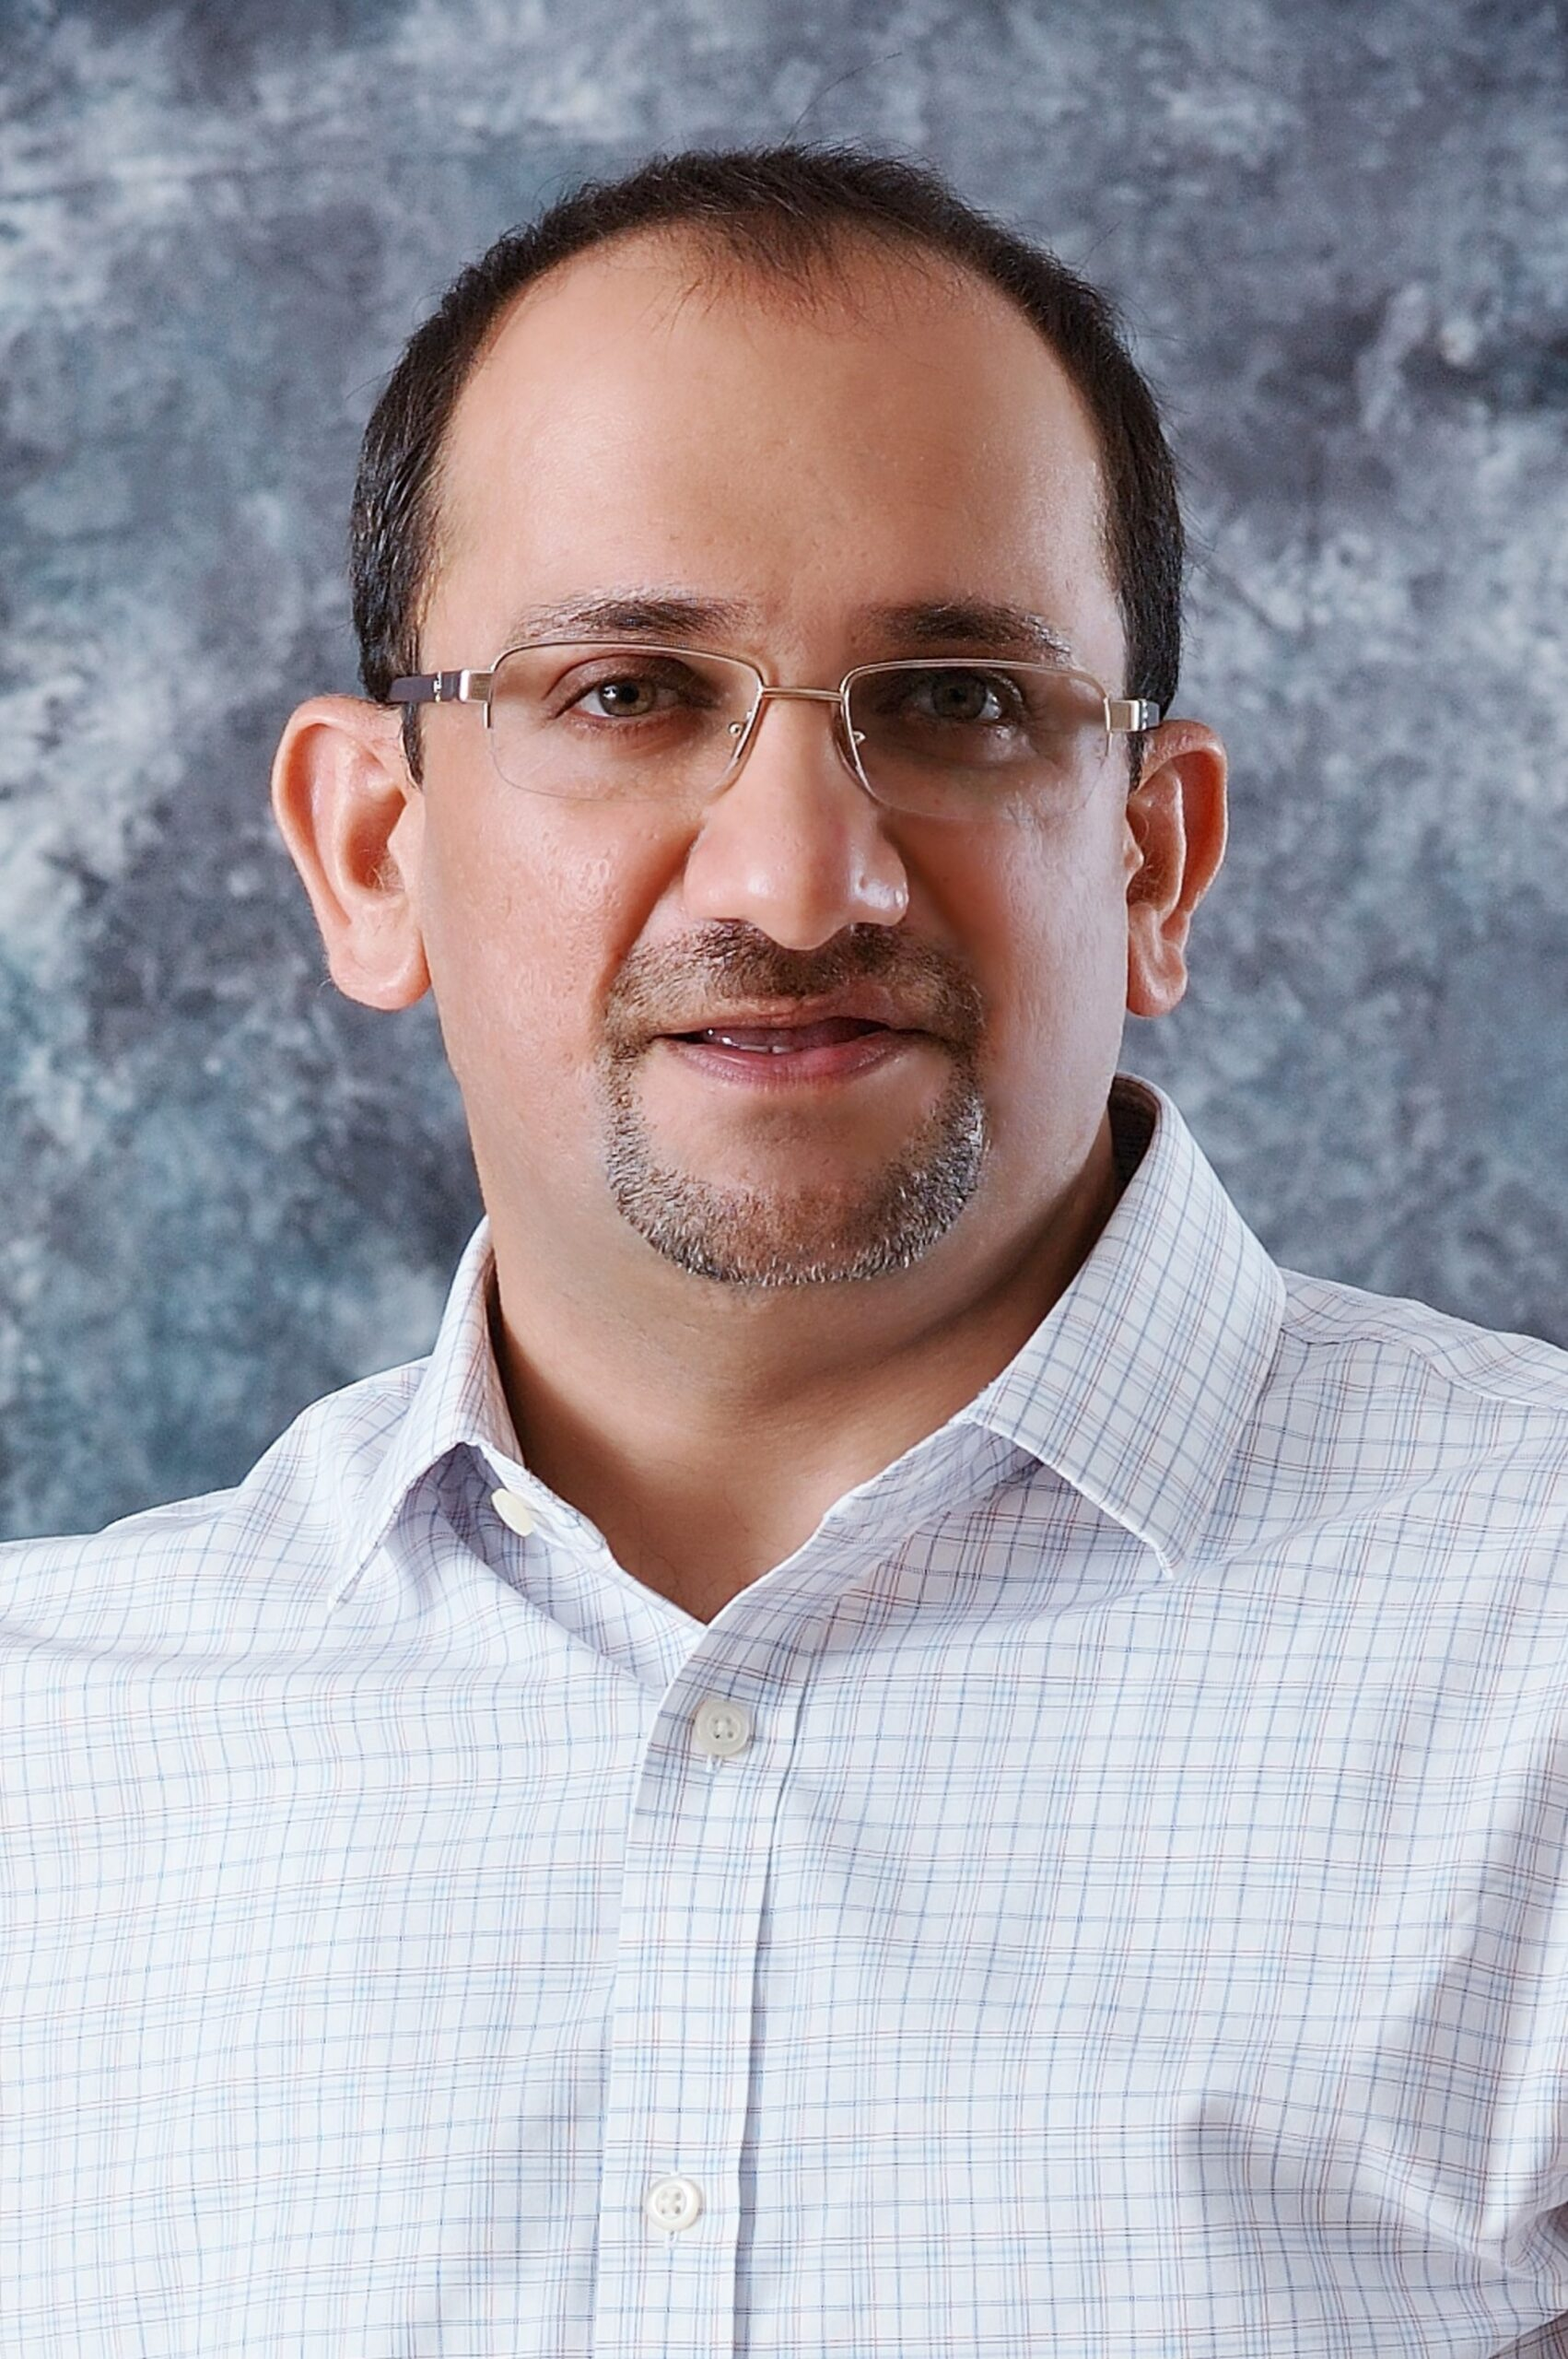 Vikram Kumar, Co-Founder of Mytat